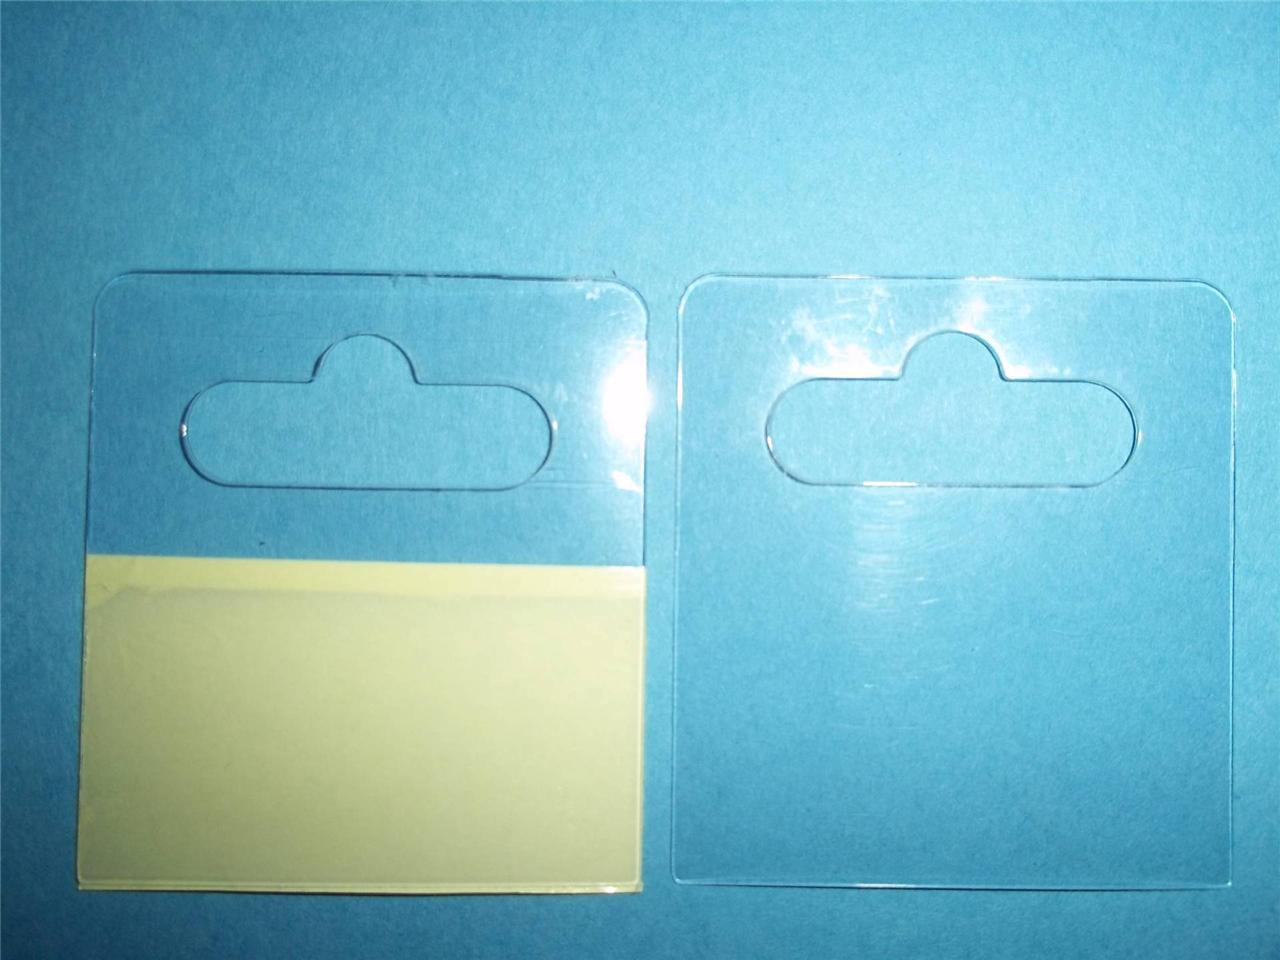 Eurohook-Slot-Hanging-Hang-Tabs-PVC-H50-x-W45-Ultra-Strong-Self-Adhesive